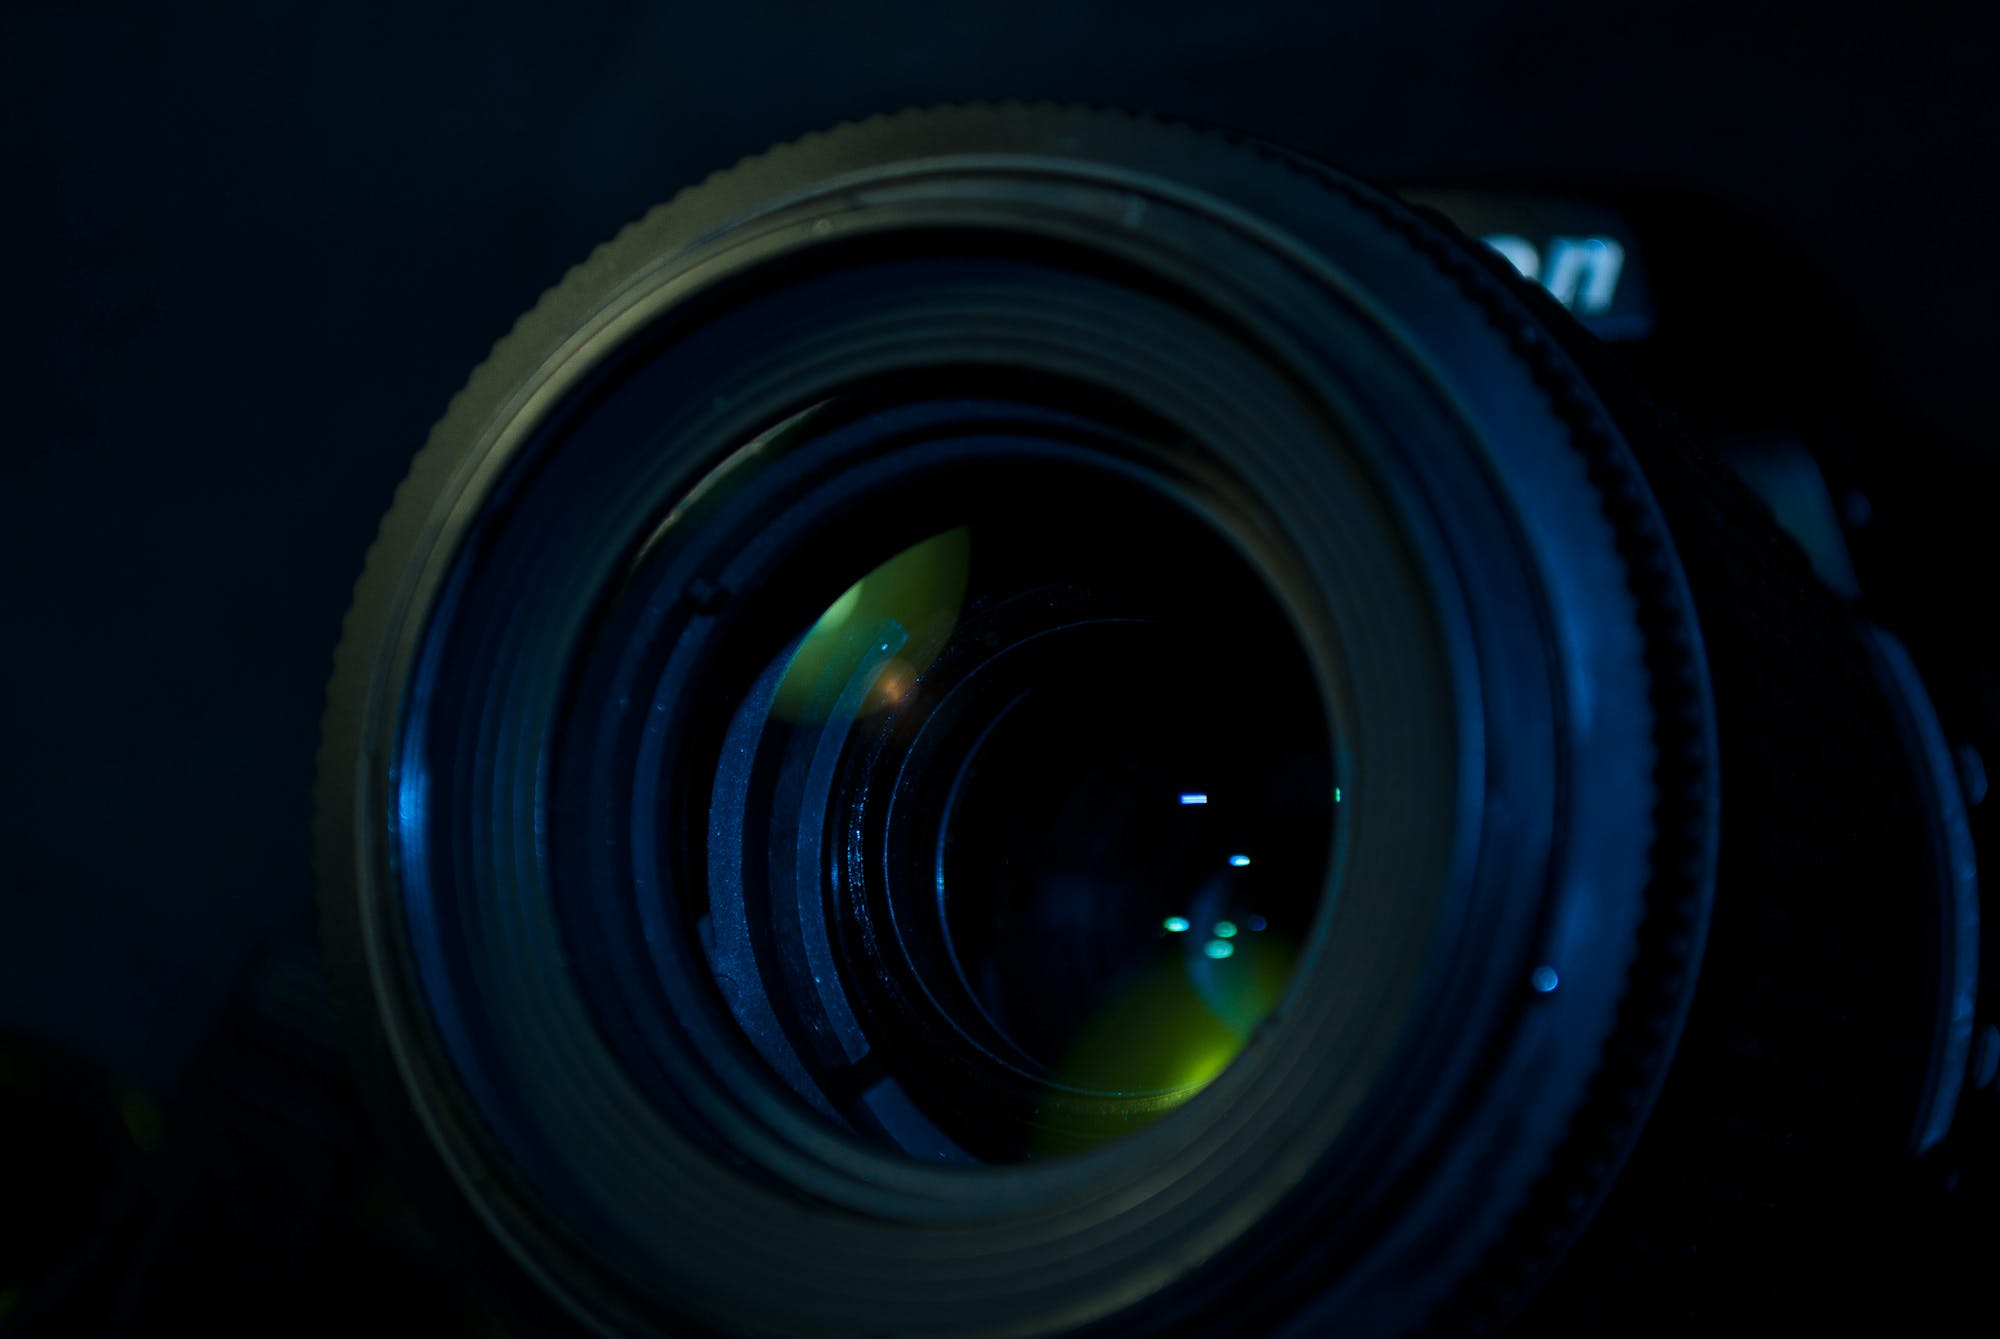 Kostenloses Stock Foto zu fokus, fotografie, kamera, kameraobjektiv